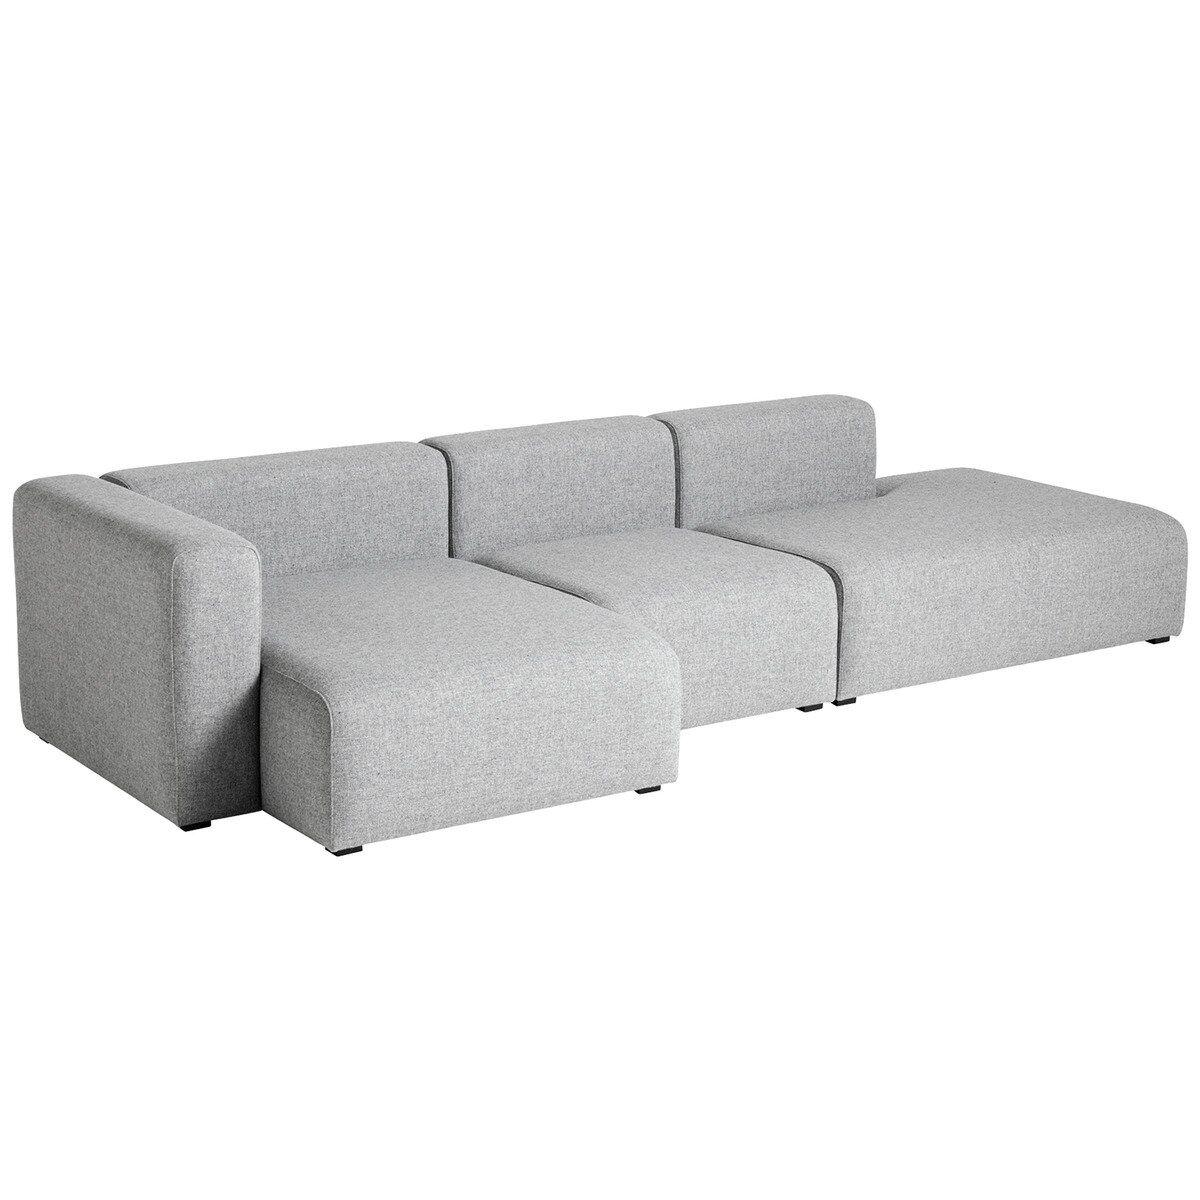 Hay Mags sohva 3-ist, Combination 4 vasen, Hallingdal 130